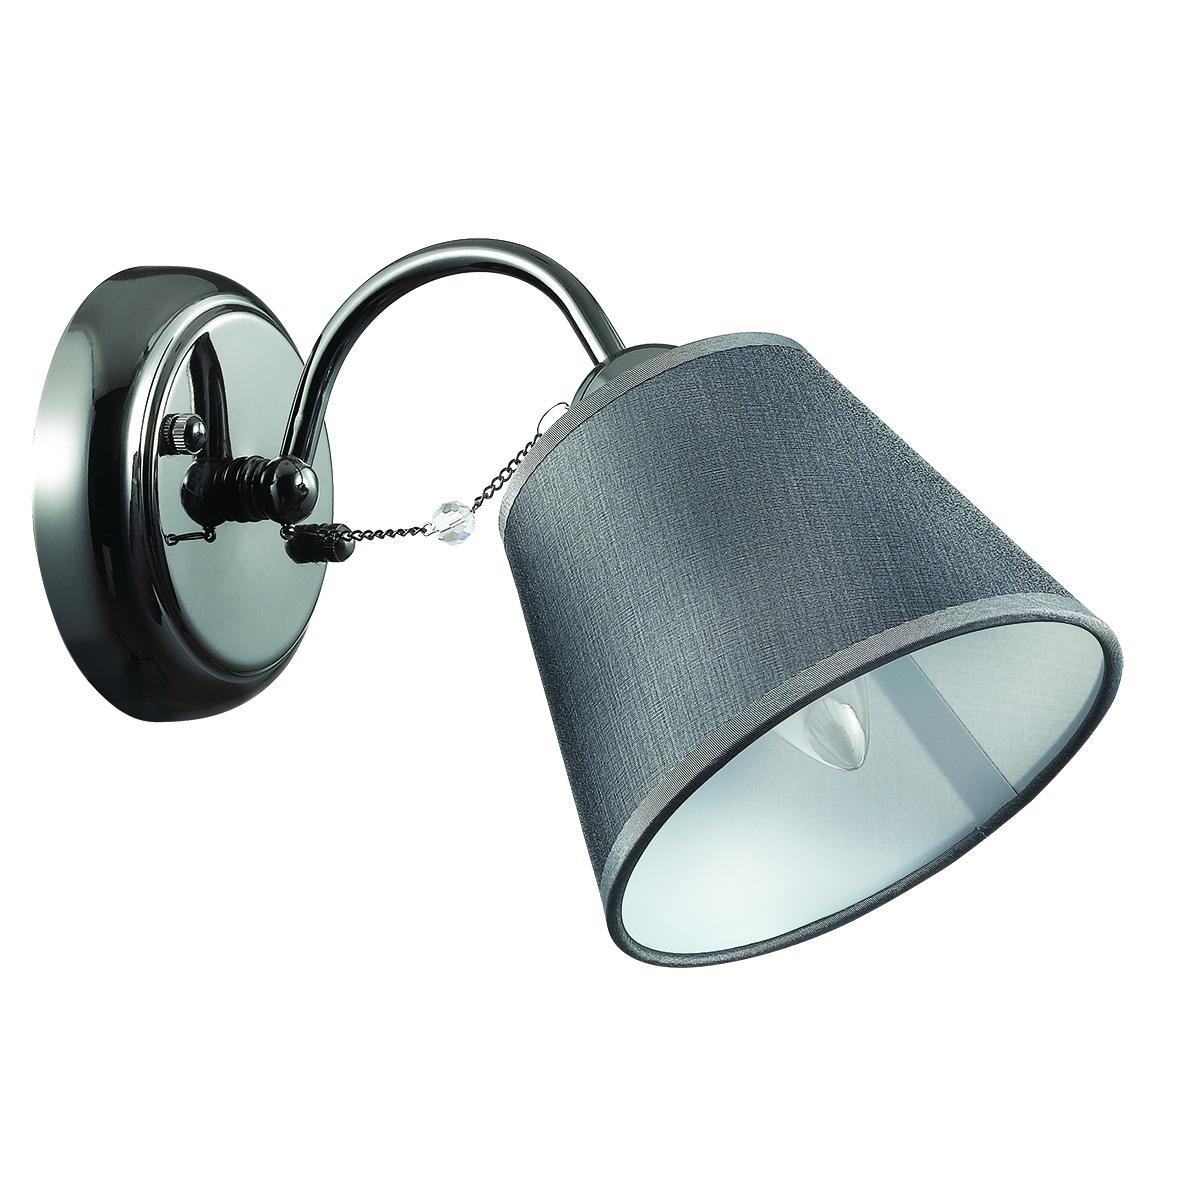 Бра Lumion Porta 2974/1W, 1xE14x40W, черный хром, серый, прозрачный, хром, металл, текстиль, хрусталь - фото 2